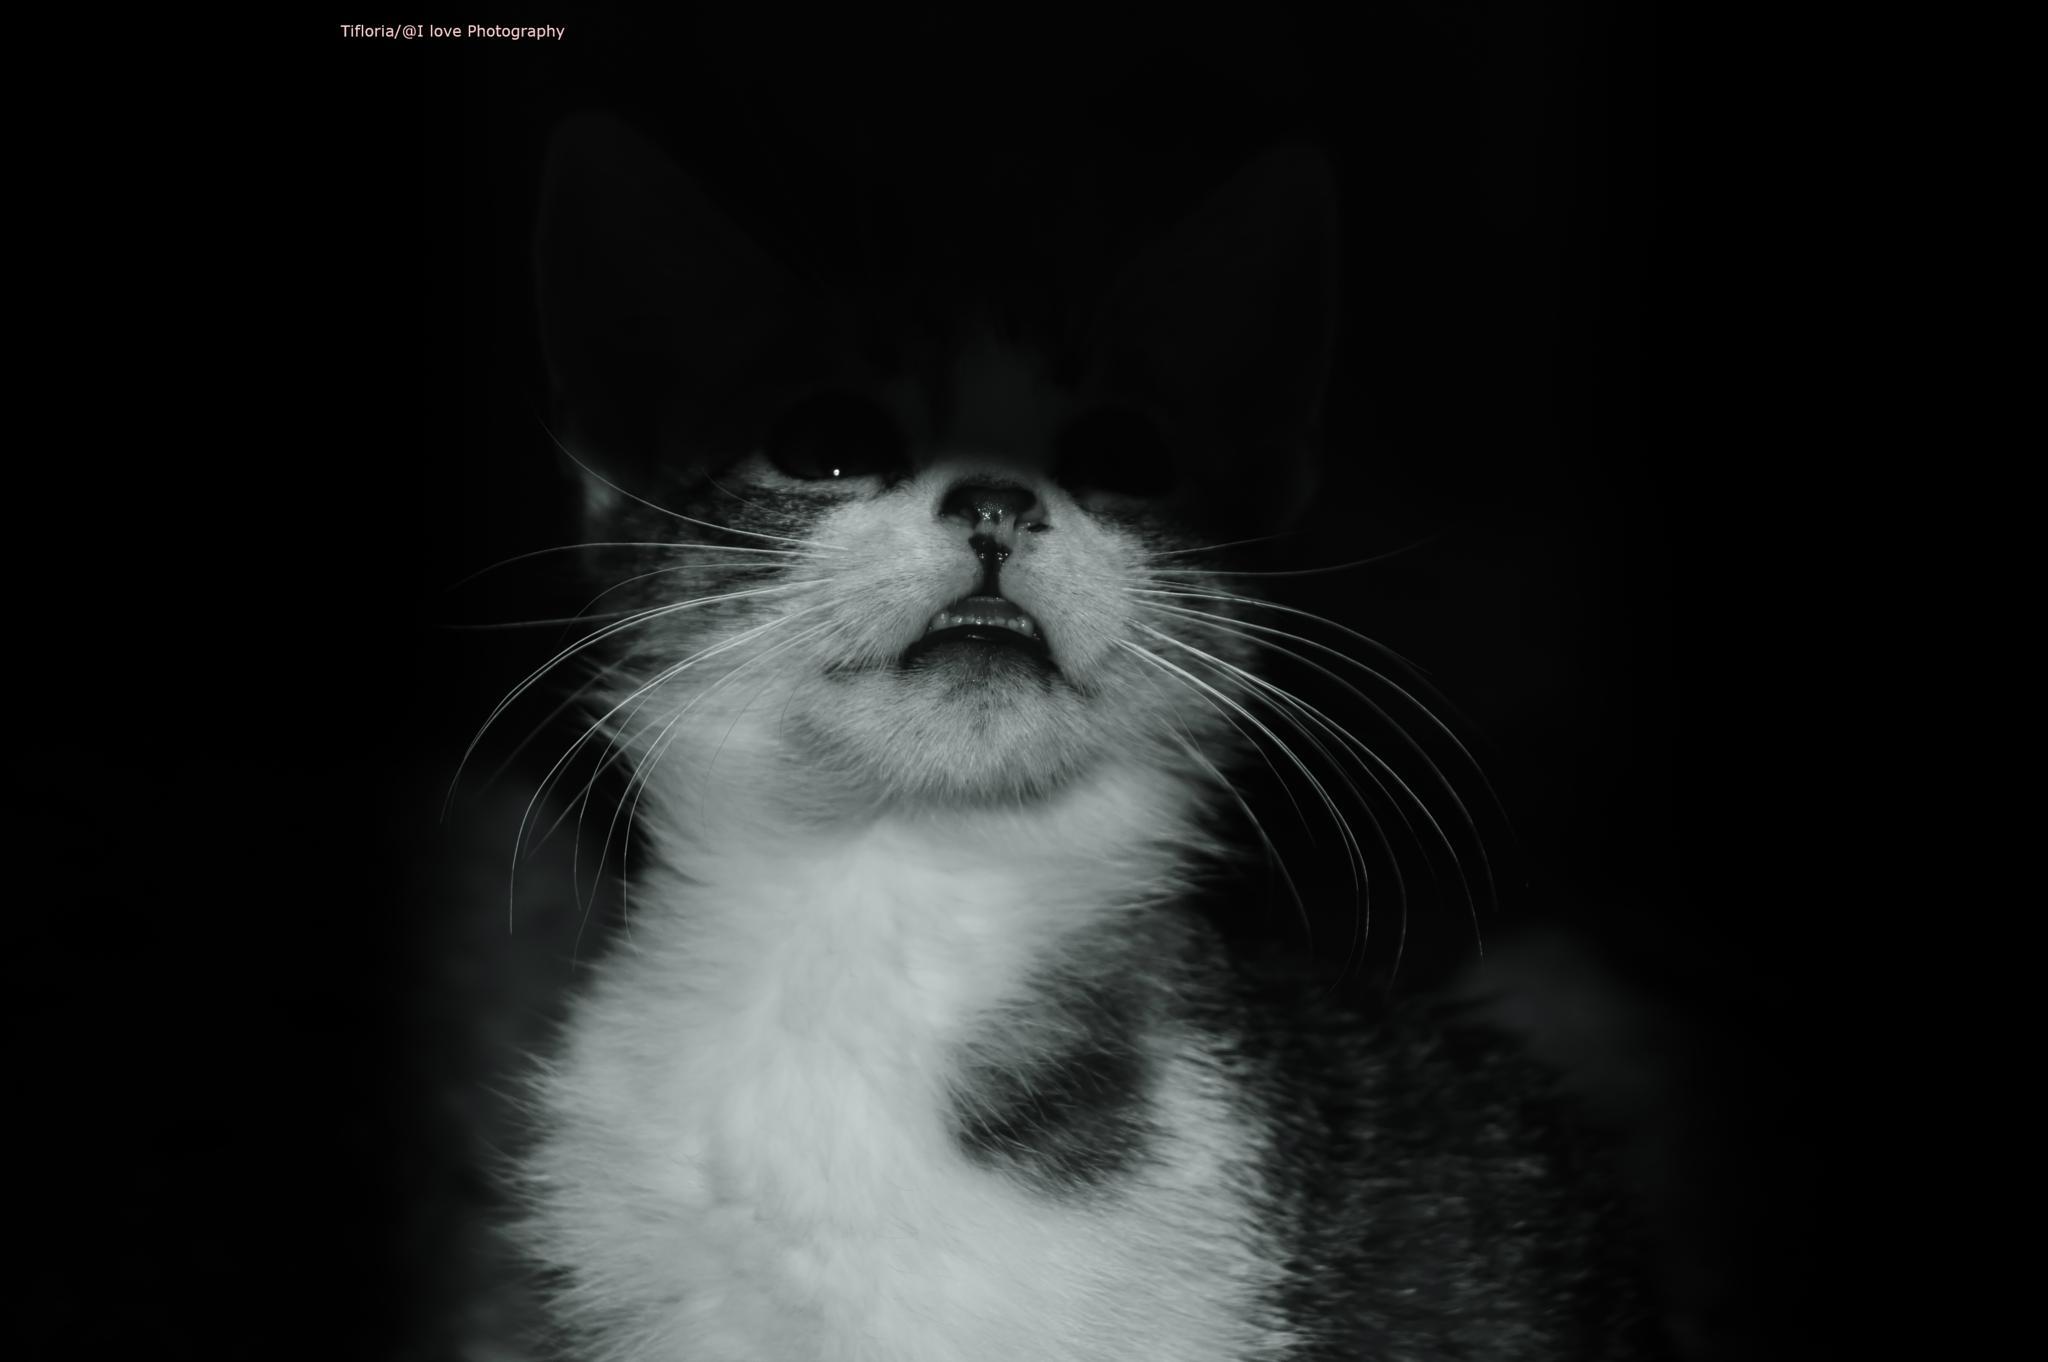 Kitty n the Darkness  by Ghizlane.Belkhanfer